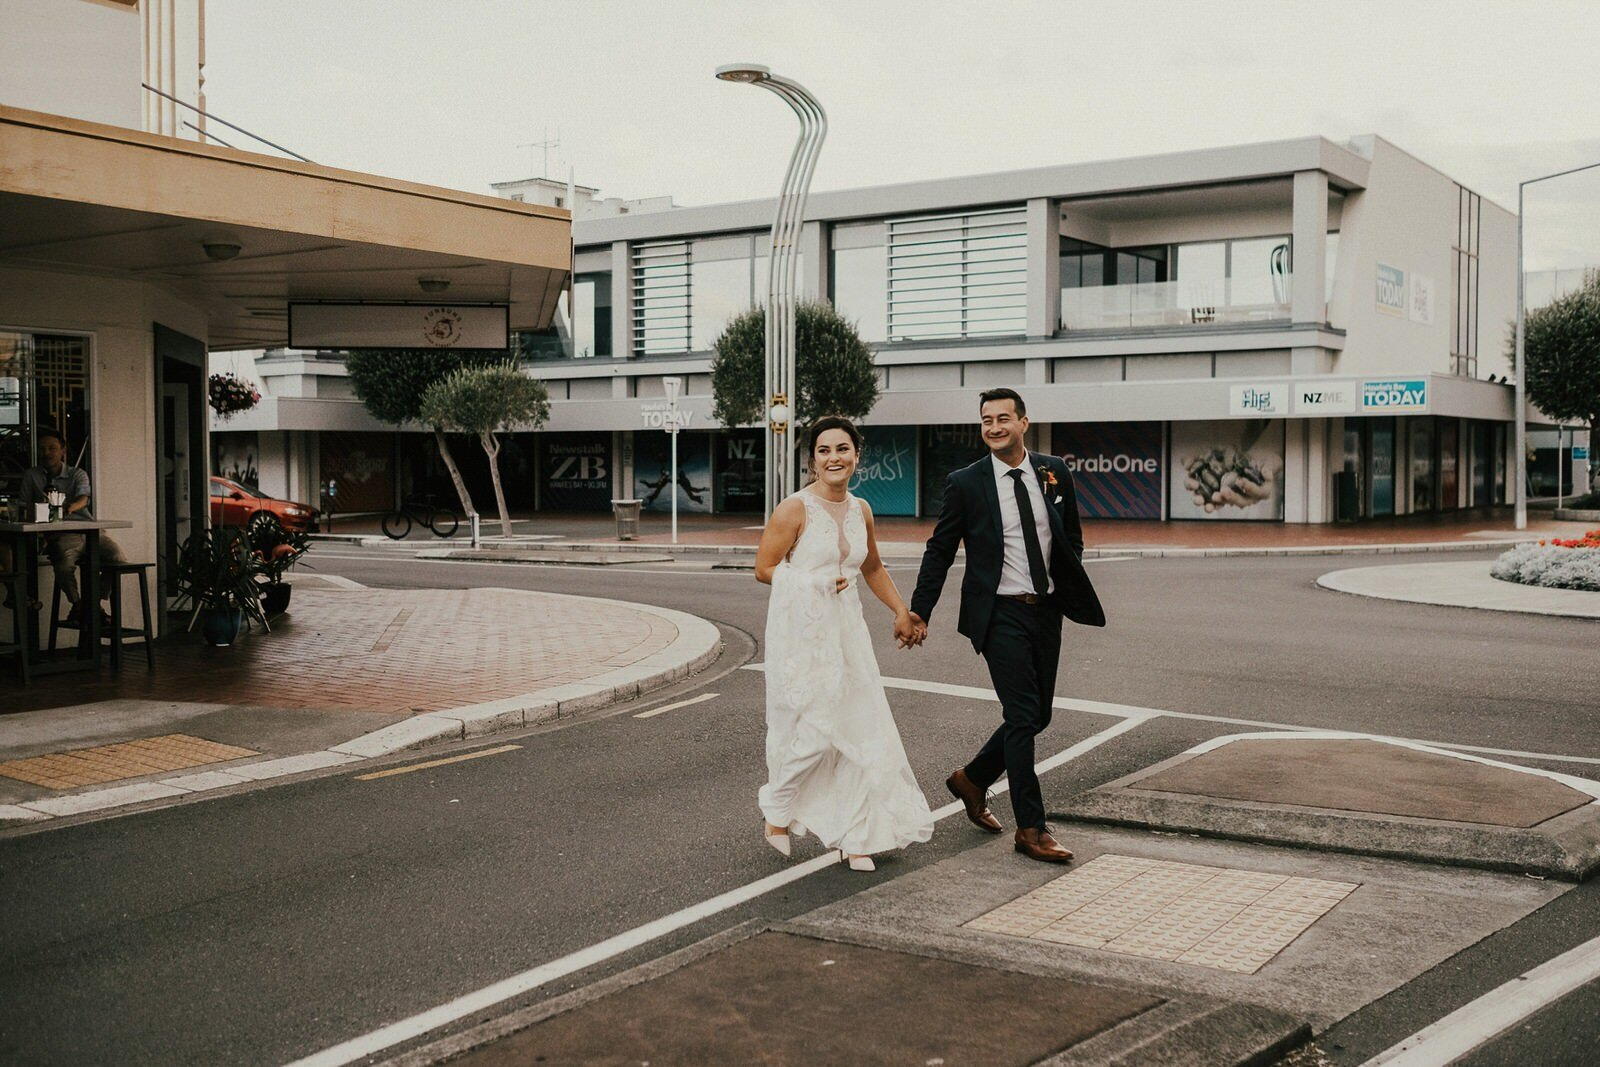 Urban Wedding Photos in Hawkes Bay